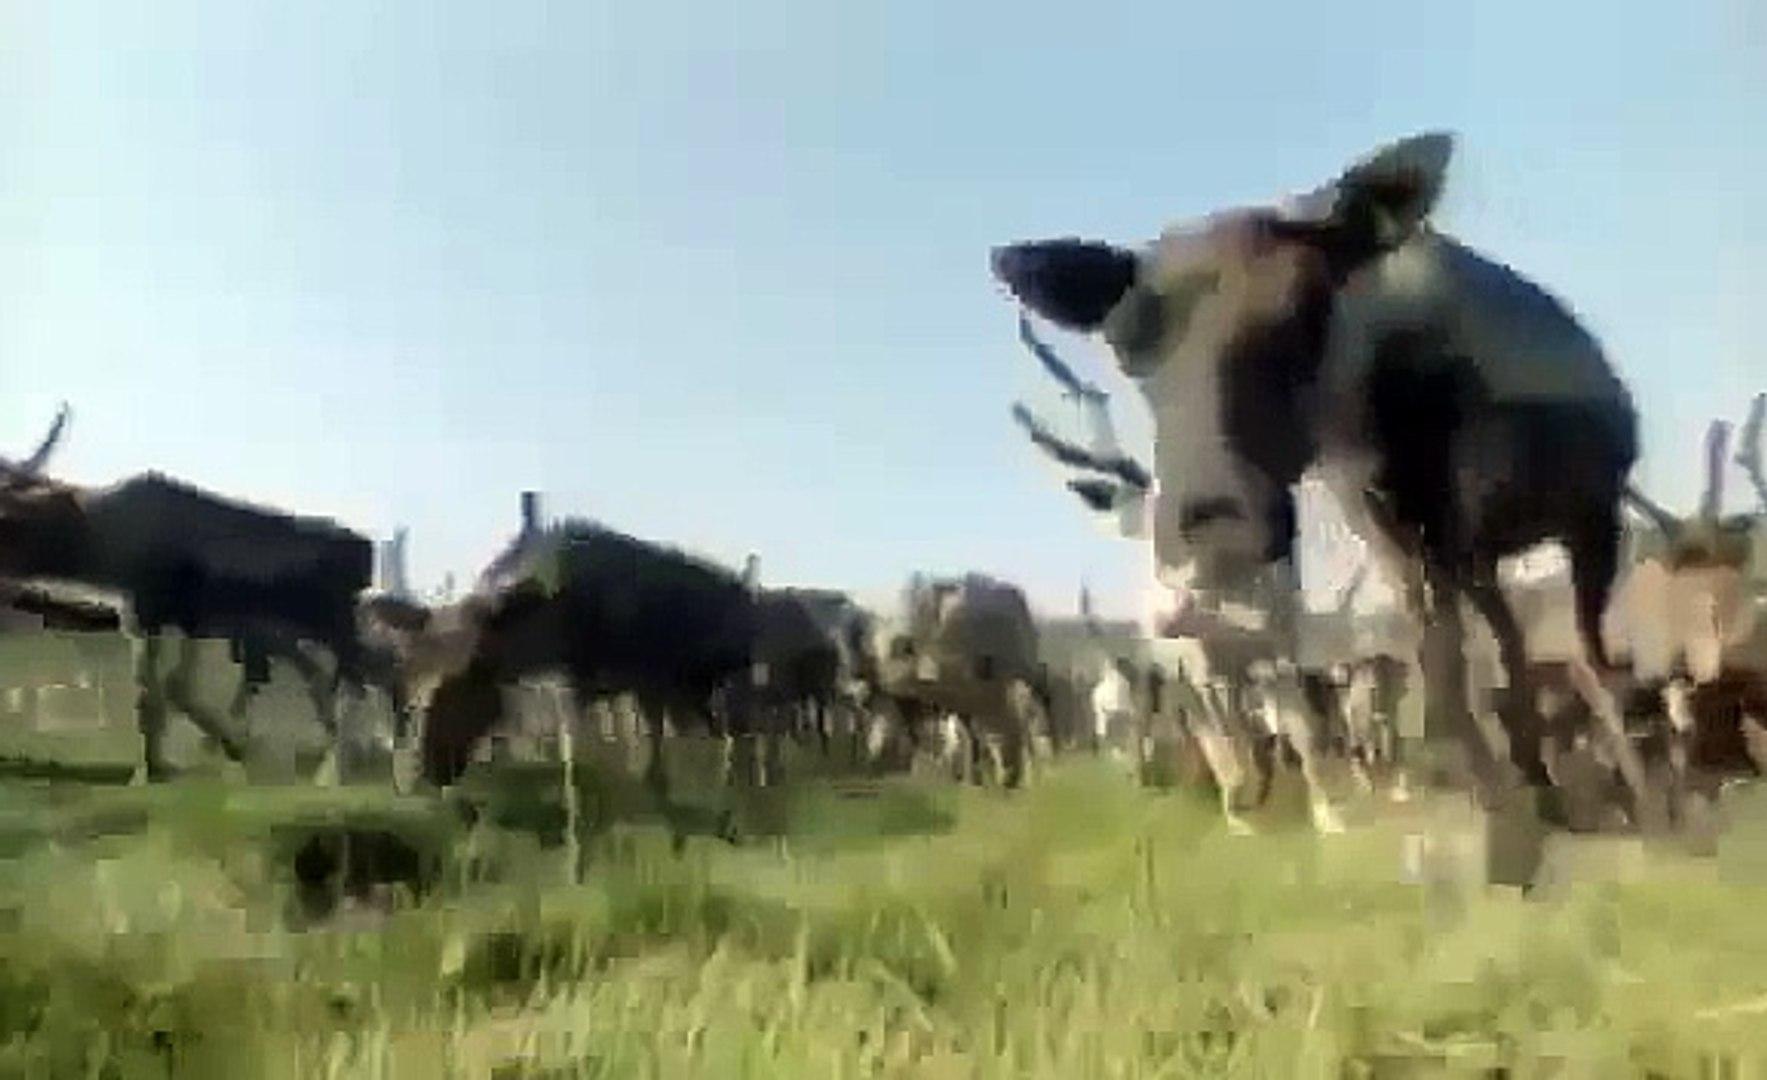 [Full Documentary 2014] Return of the Caribou - NEW+ ANIMAL DOCUMENTARY